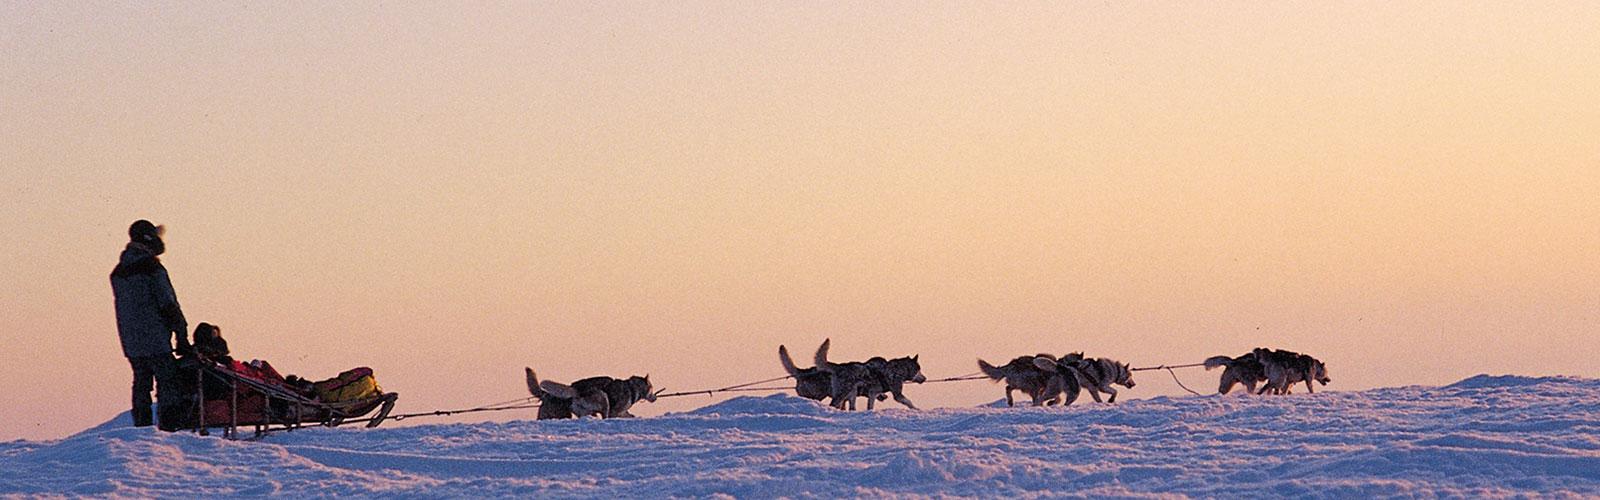 Image - Finland Husky Sledding © Finland Tourist Board